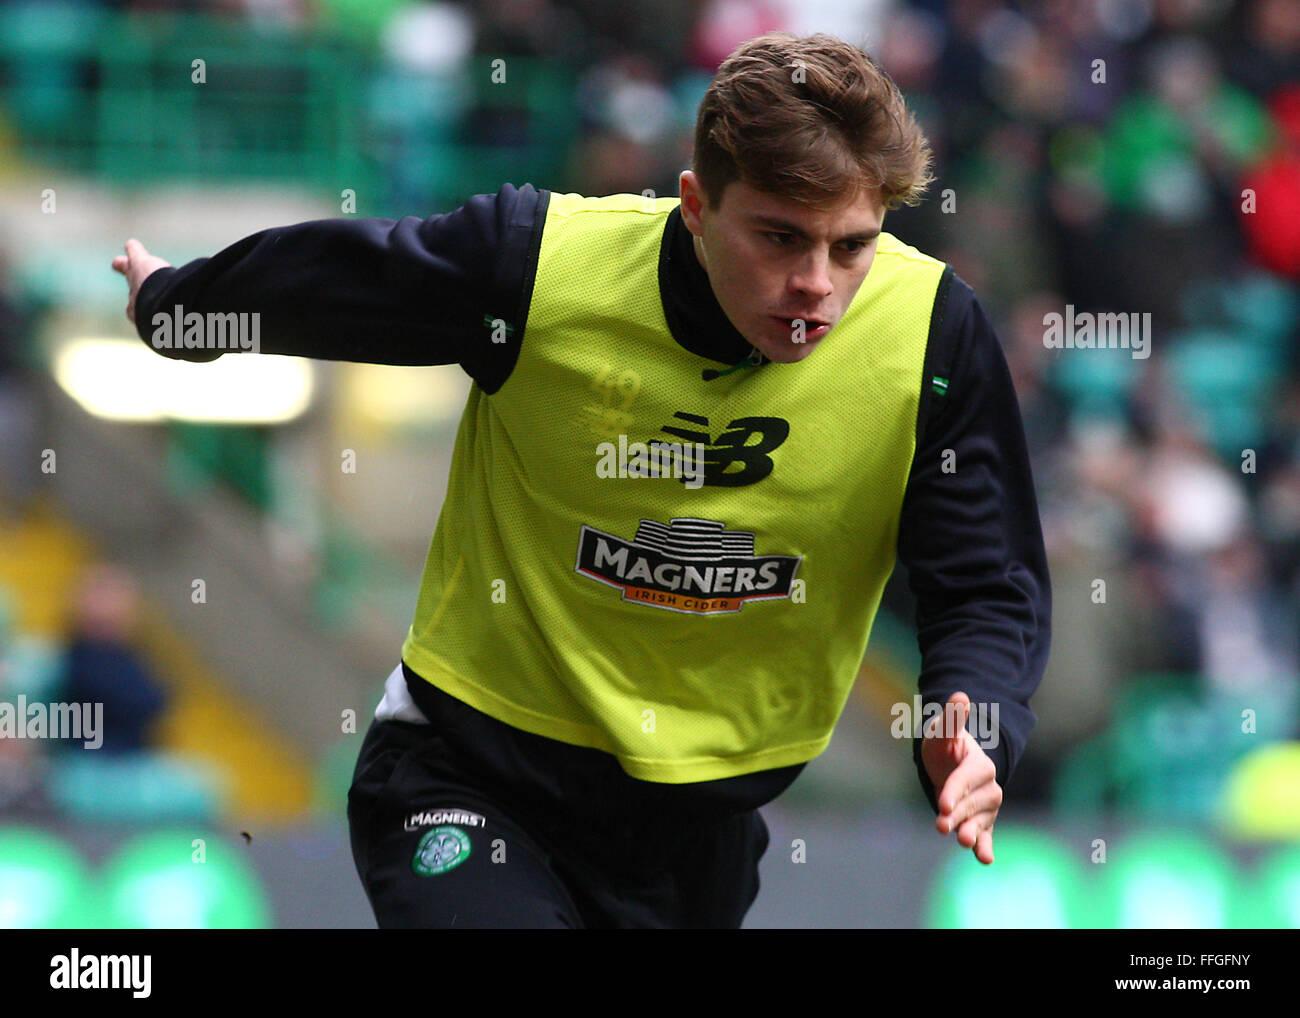 Glasgow, Scotland, UK. 13th Feb, 2016. James Forrest of Celtic during the Celtic v Ross County Ladbrokes Scottish - Stock Image